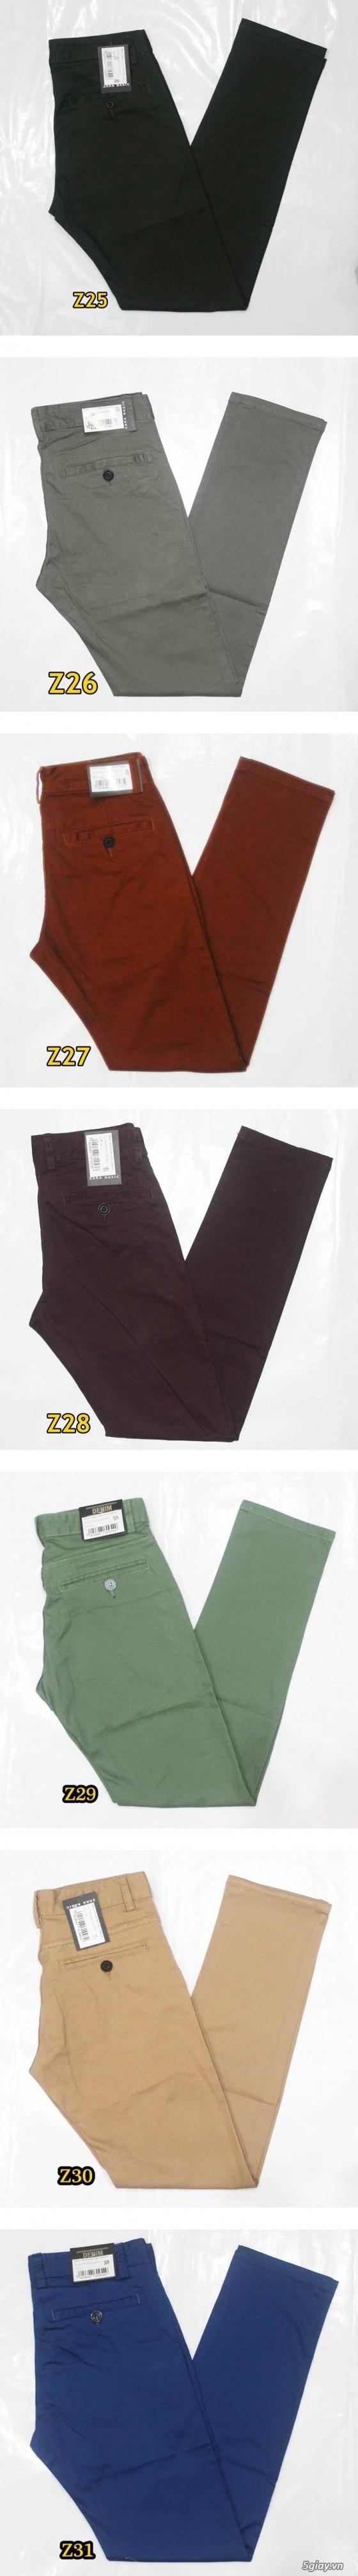 Quần kaki ZARA SlimFit,quần jean Levi's 511 SlimFit,quần short SuperDry,short jean CK - 42